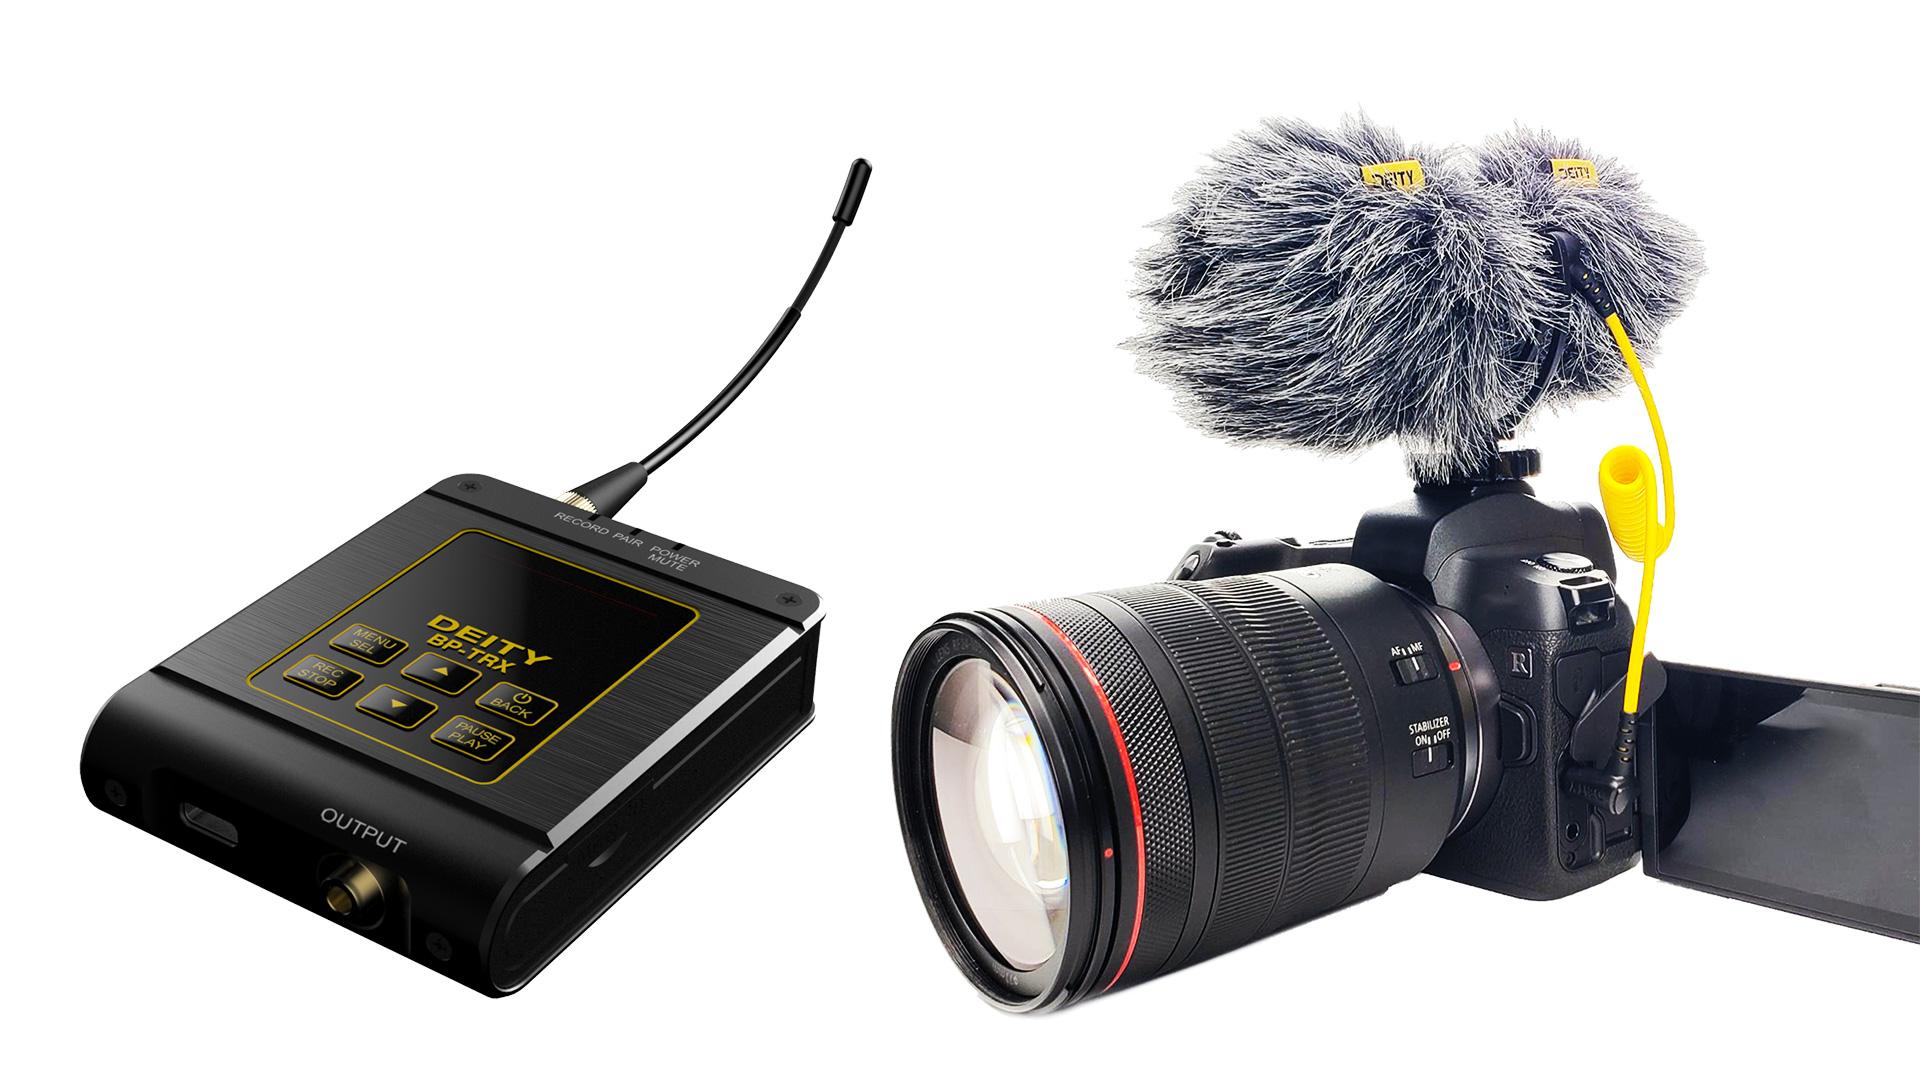 Grabador transceptor Deity BP-TRX - Micrófono D4 Duo - Deity Connect FW V2.0